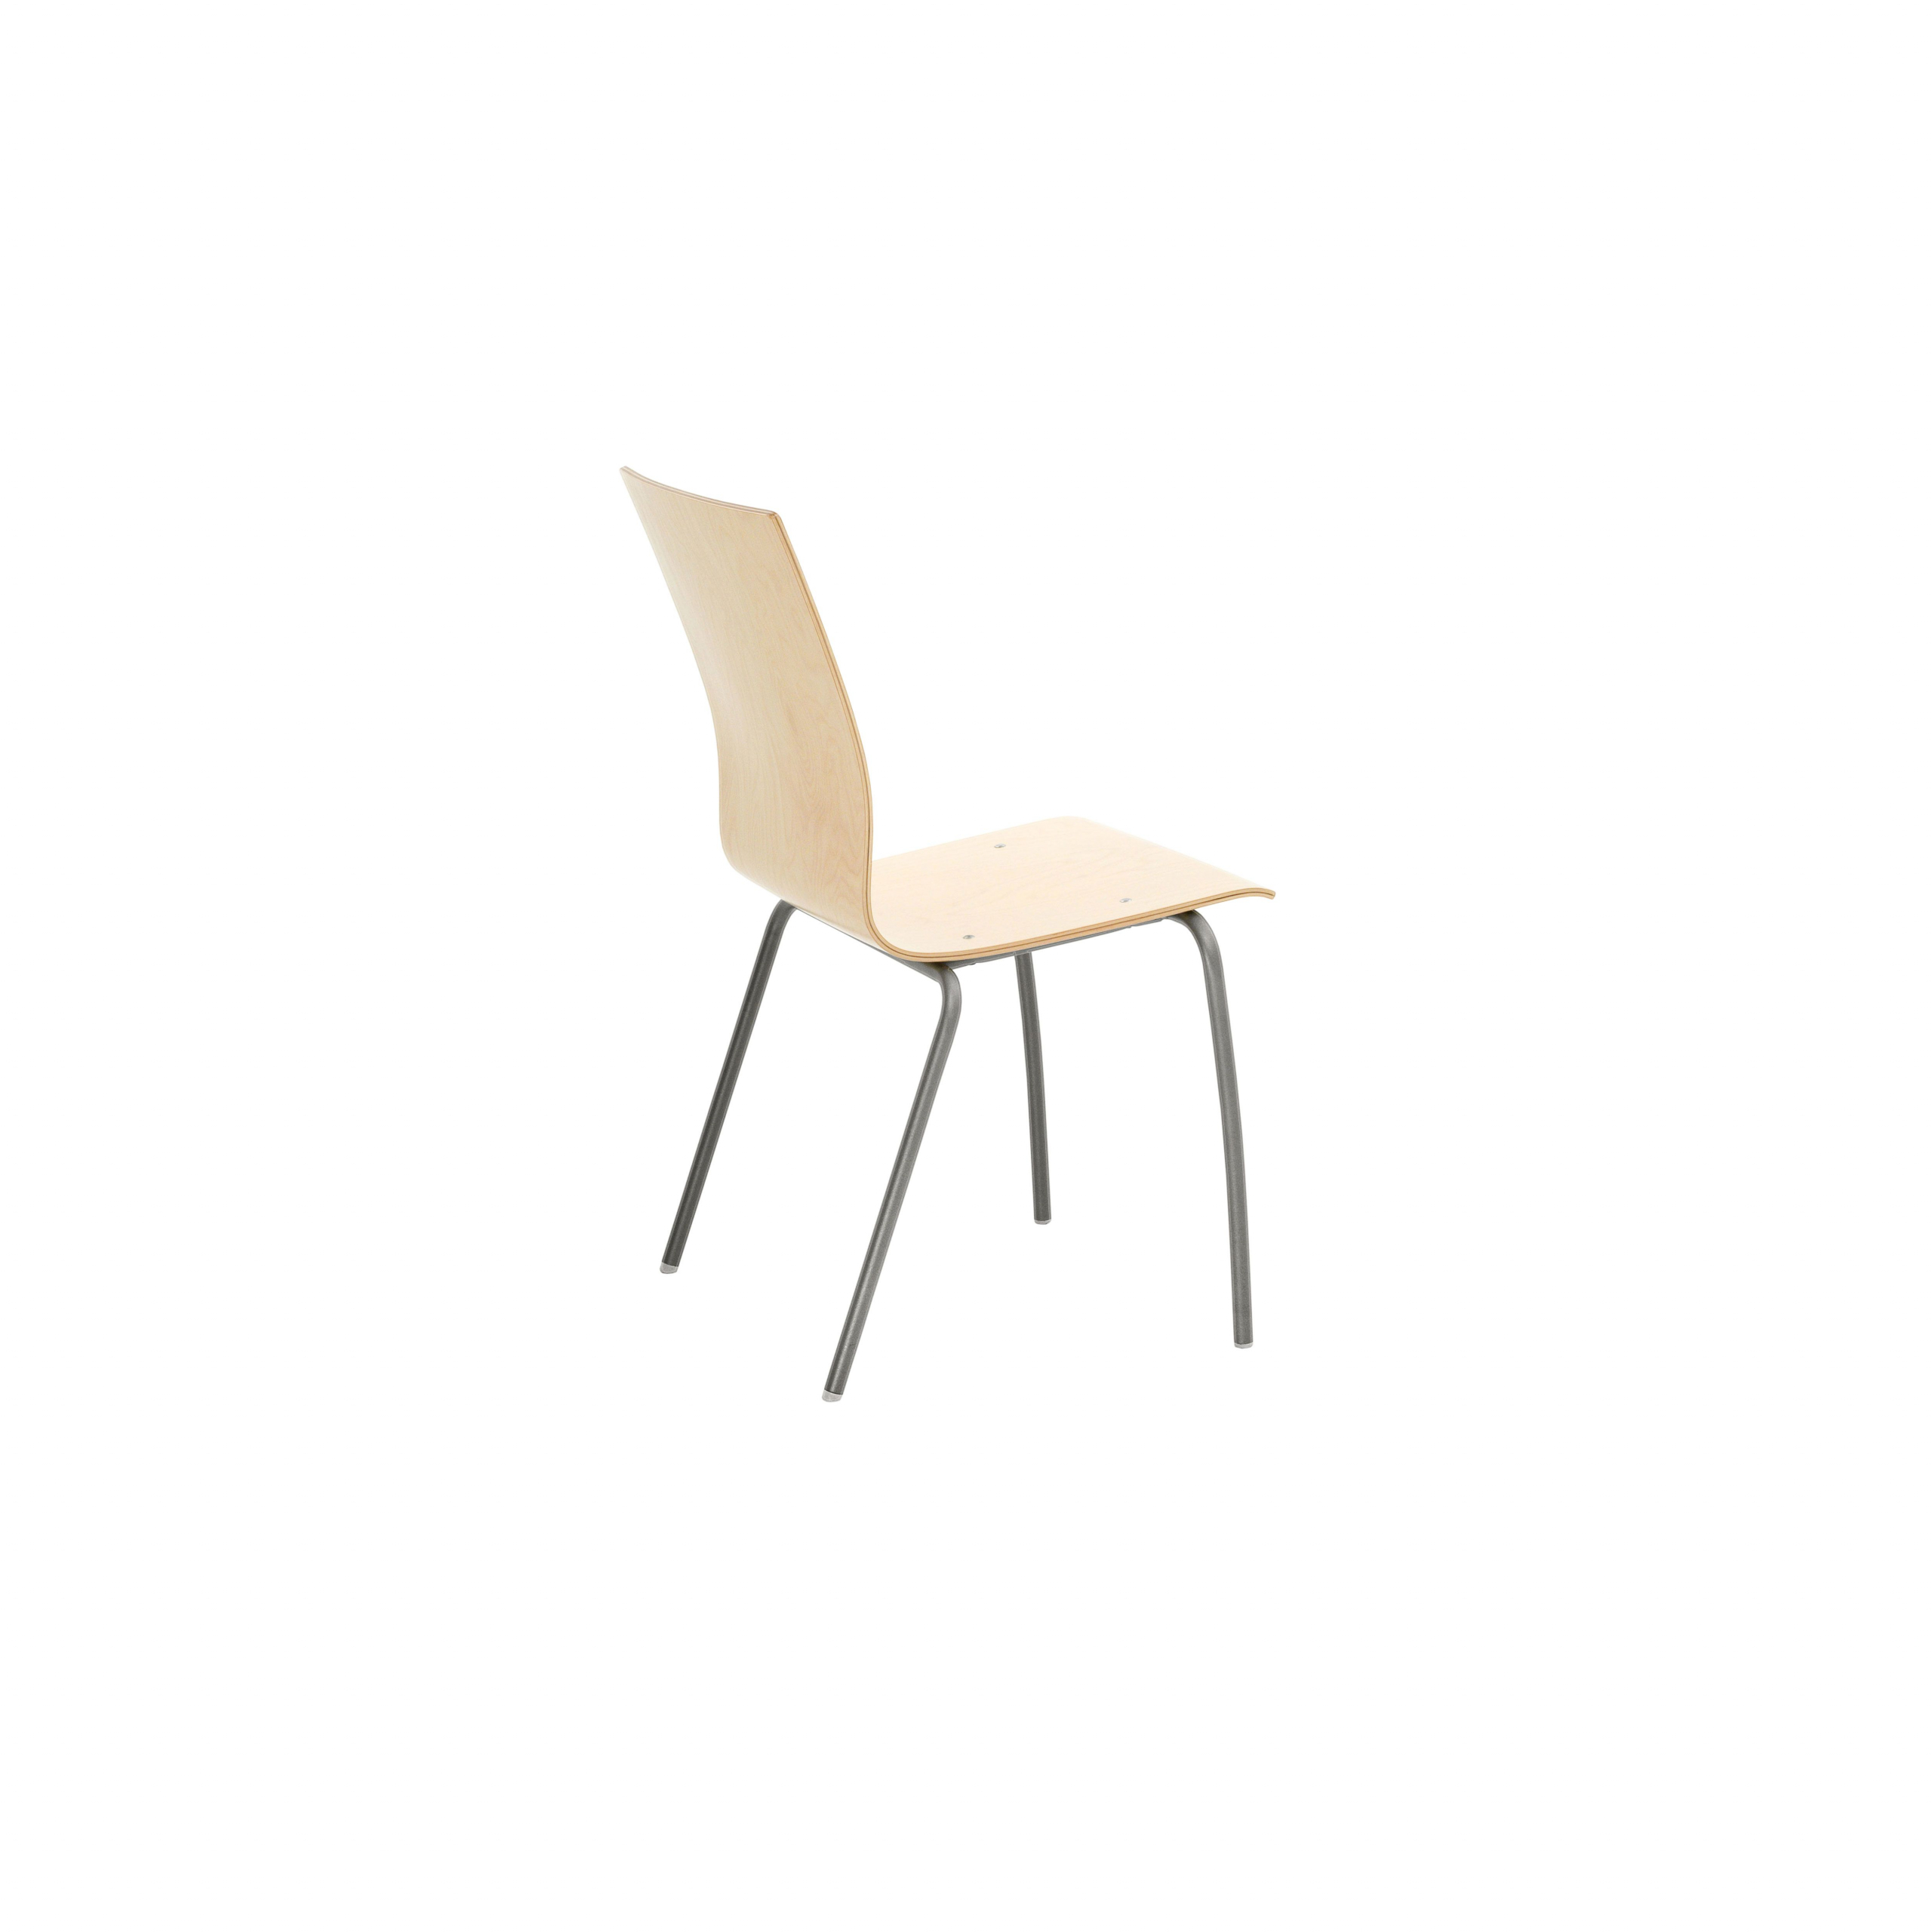 Sit Stol med metallben produktbild 2